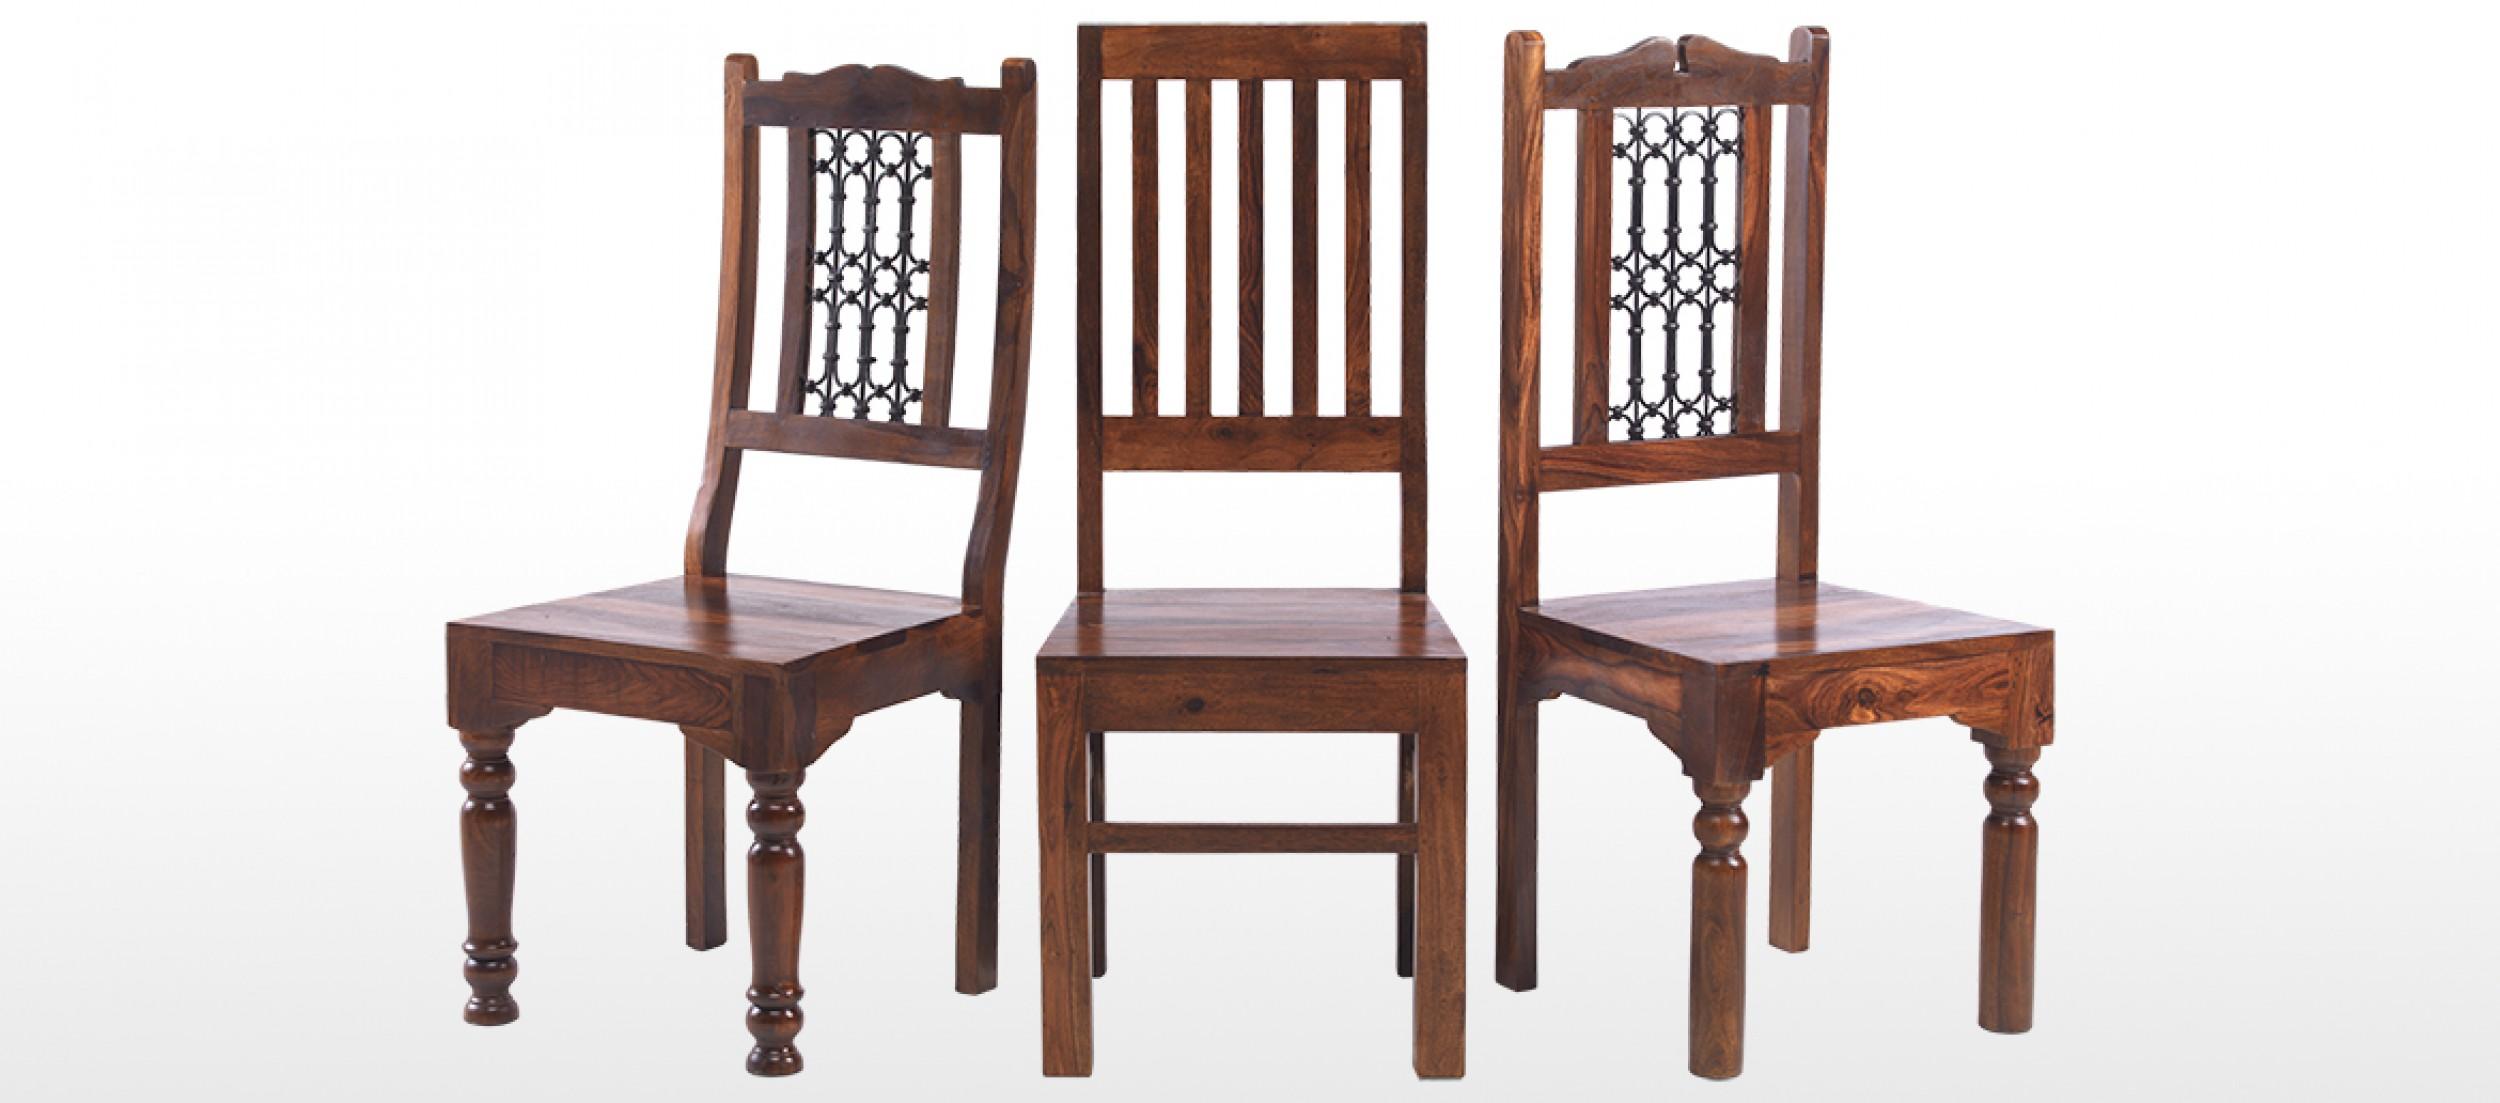 low back dining chairs pink desk chair uk jali sheesham ironwork pair